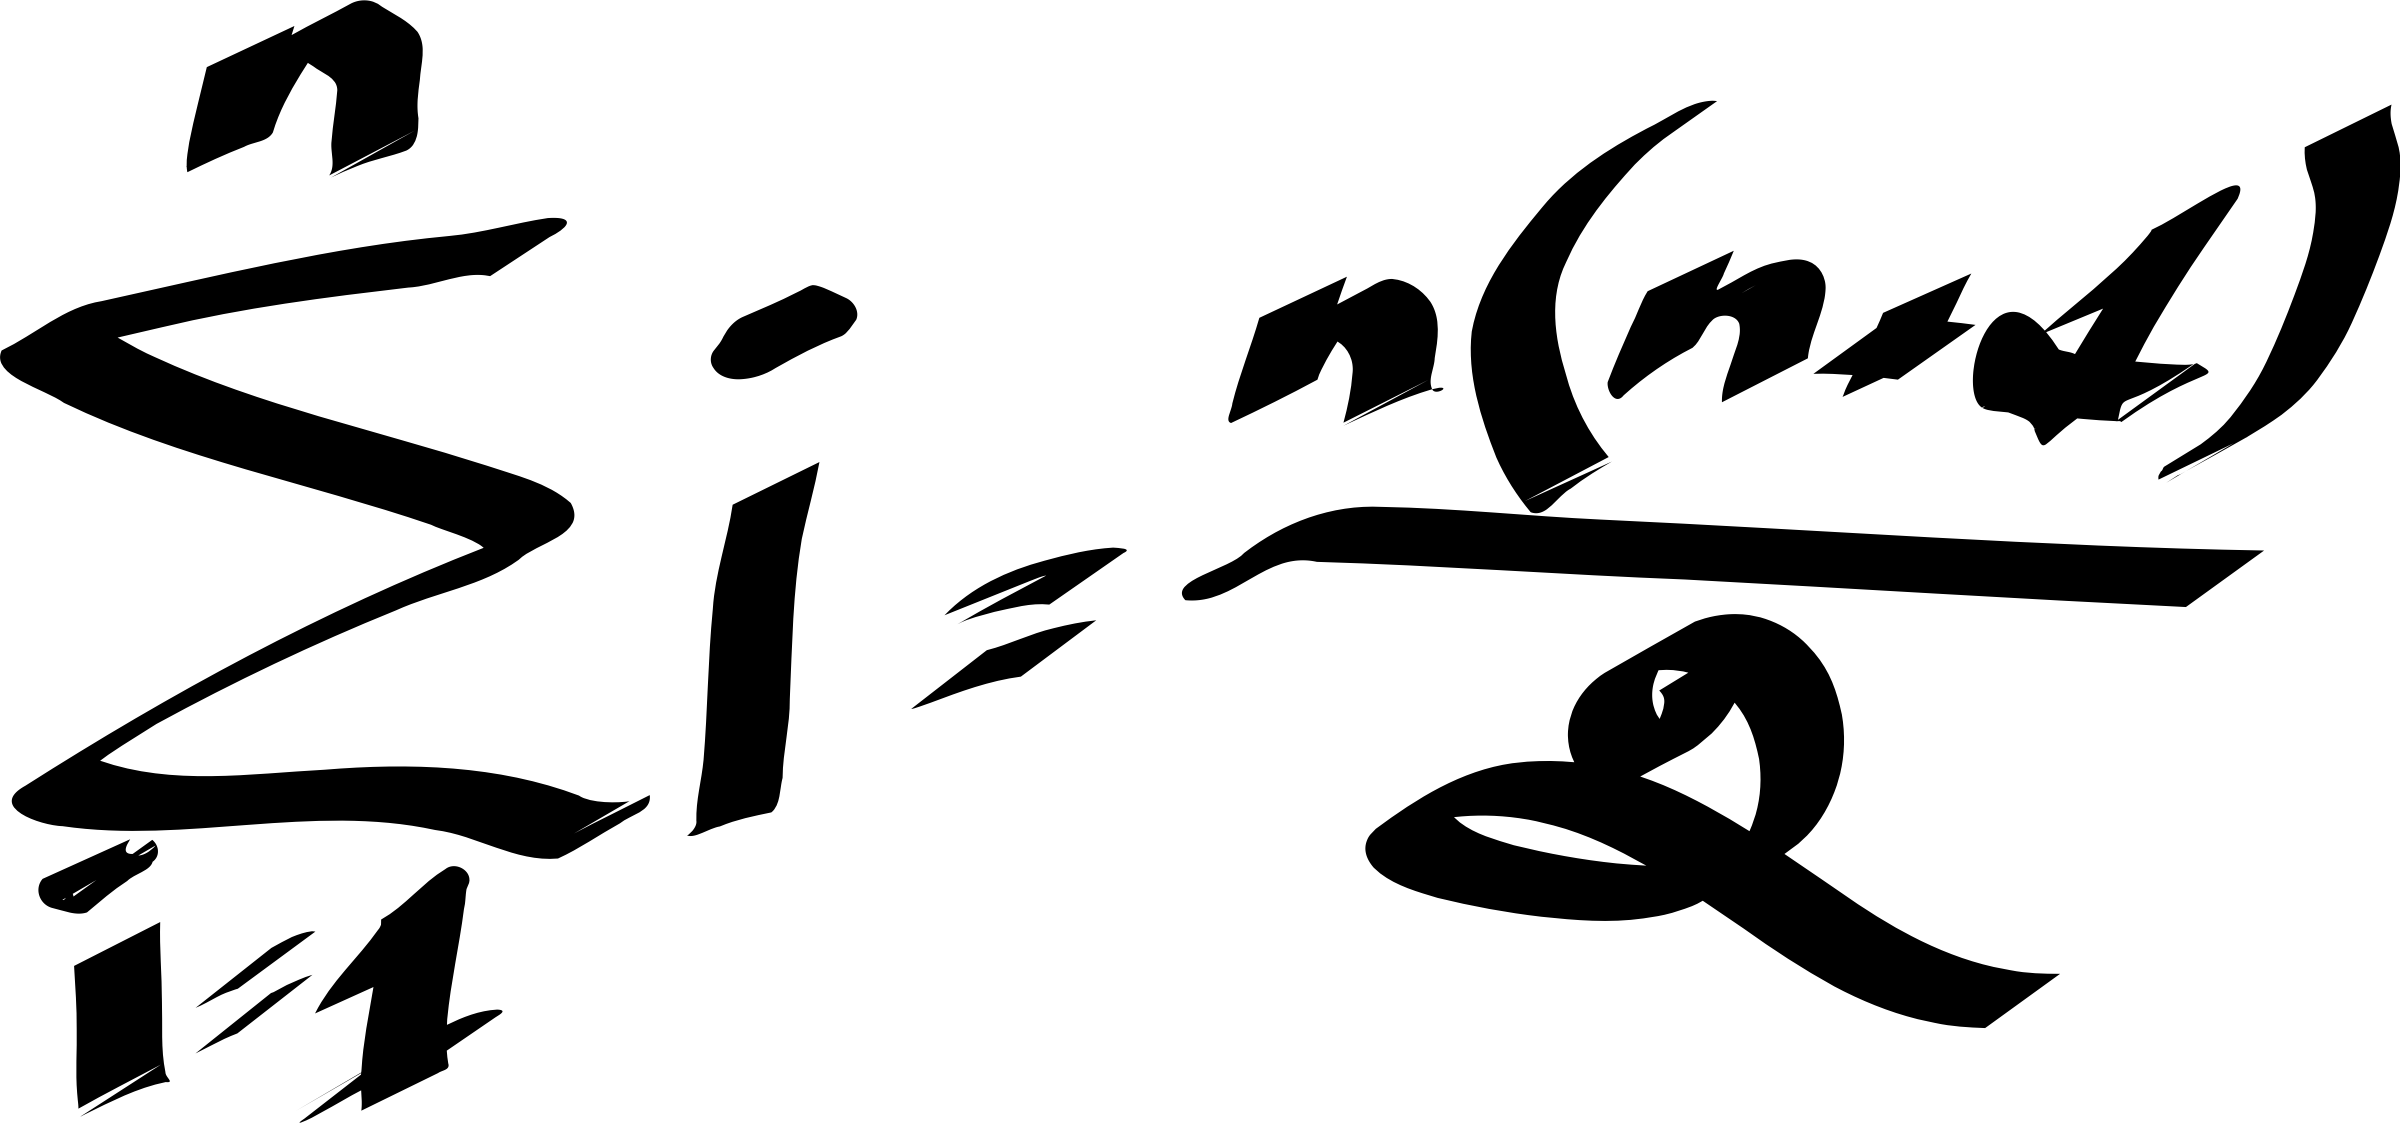 Clipart Math Sum Clipart Math Sum Transparent Free For